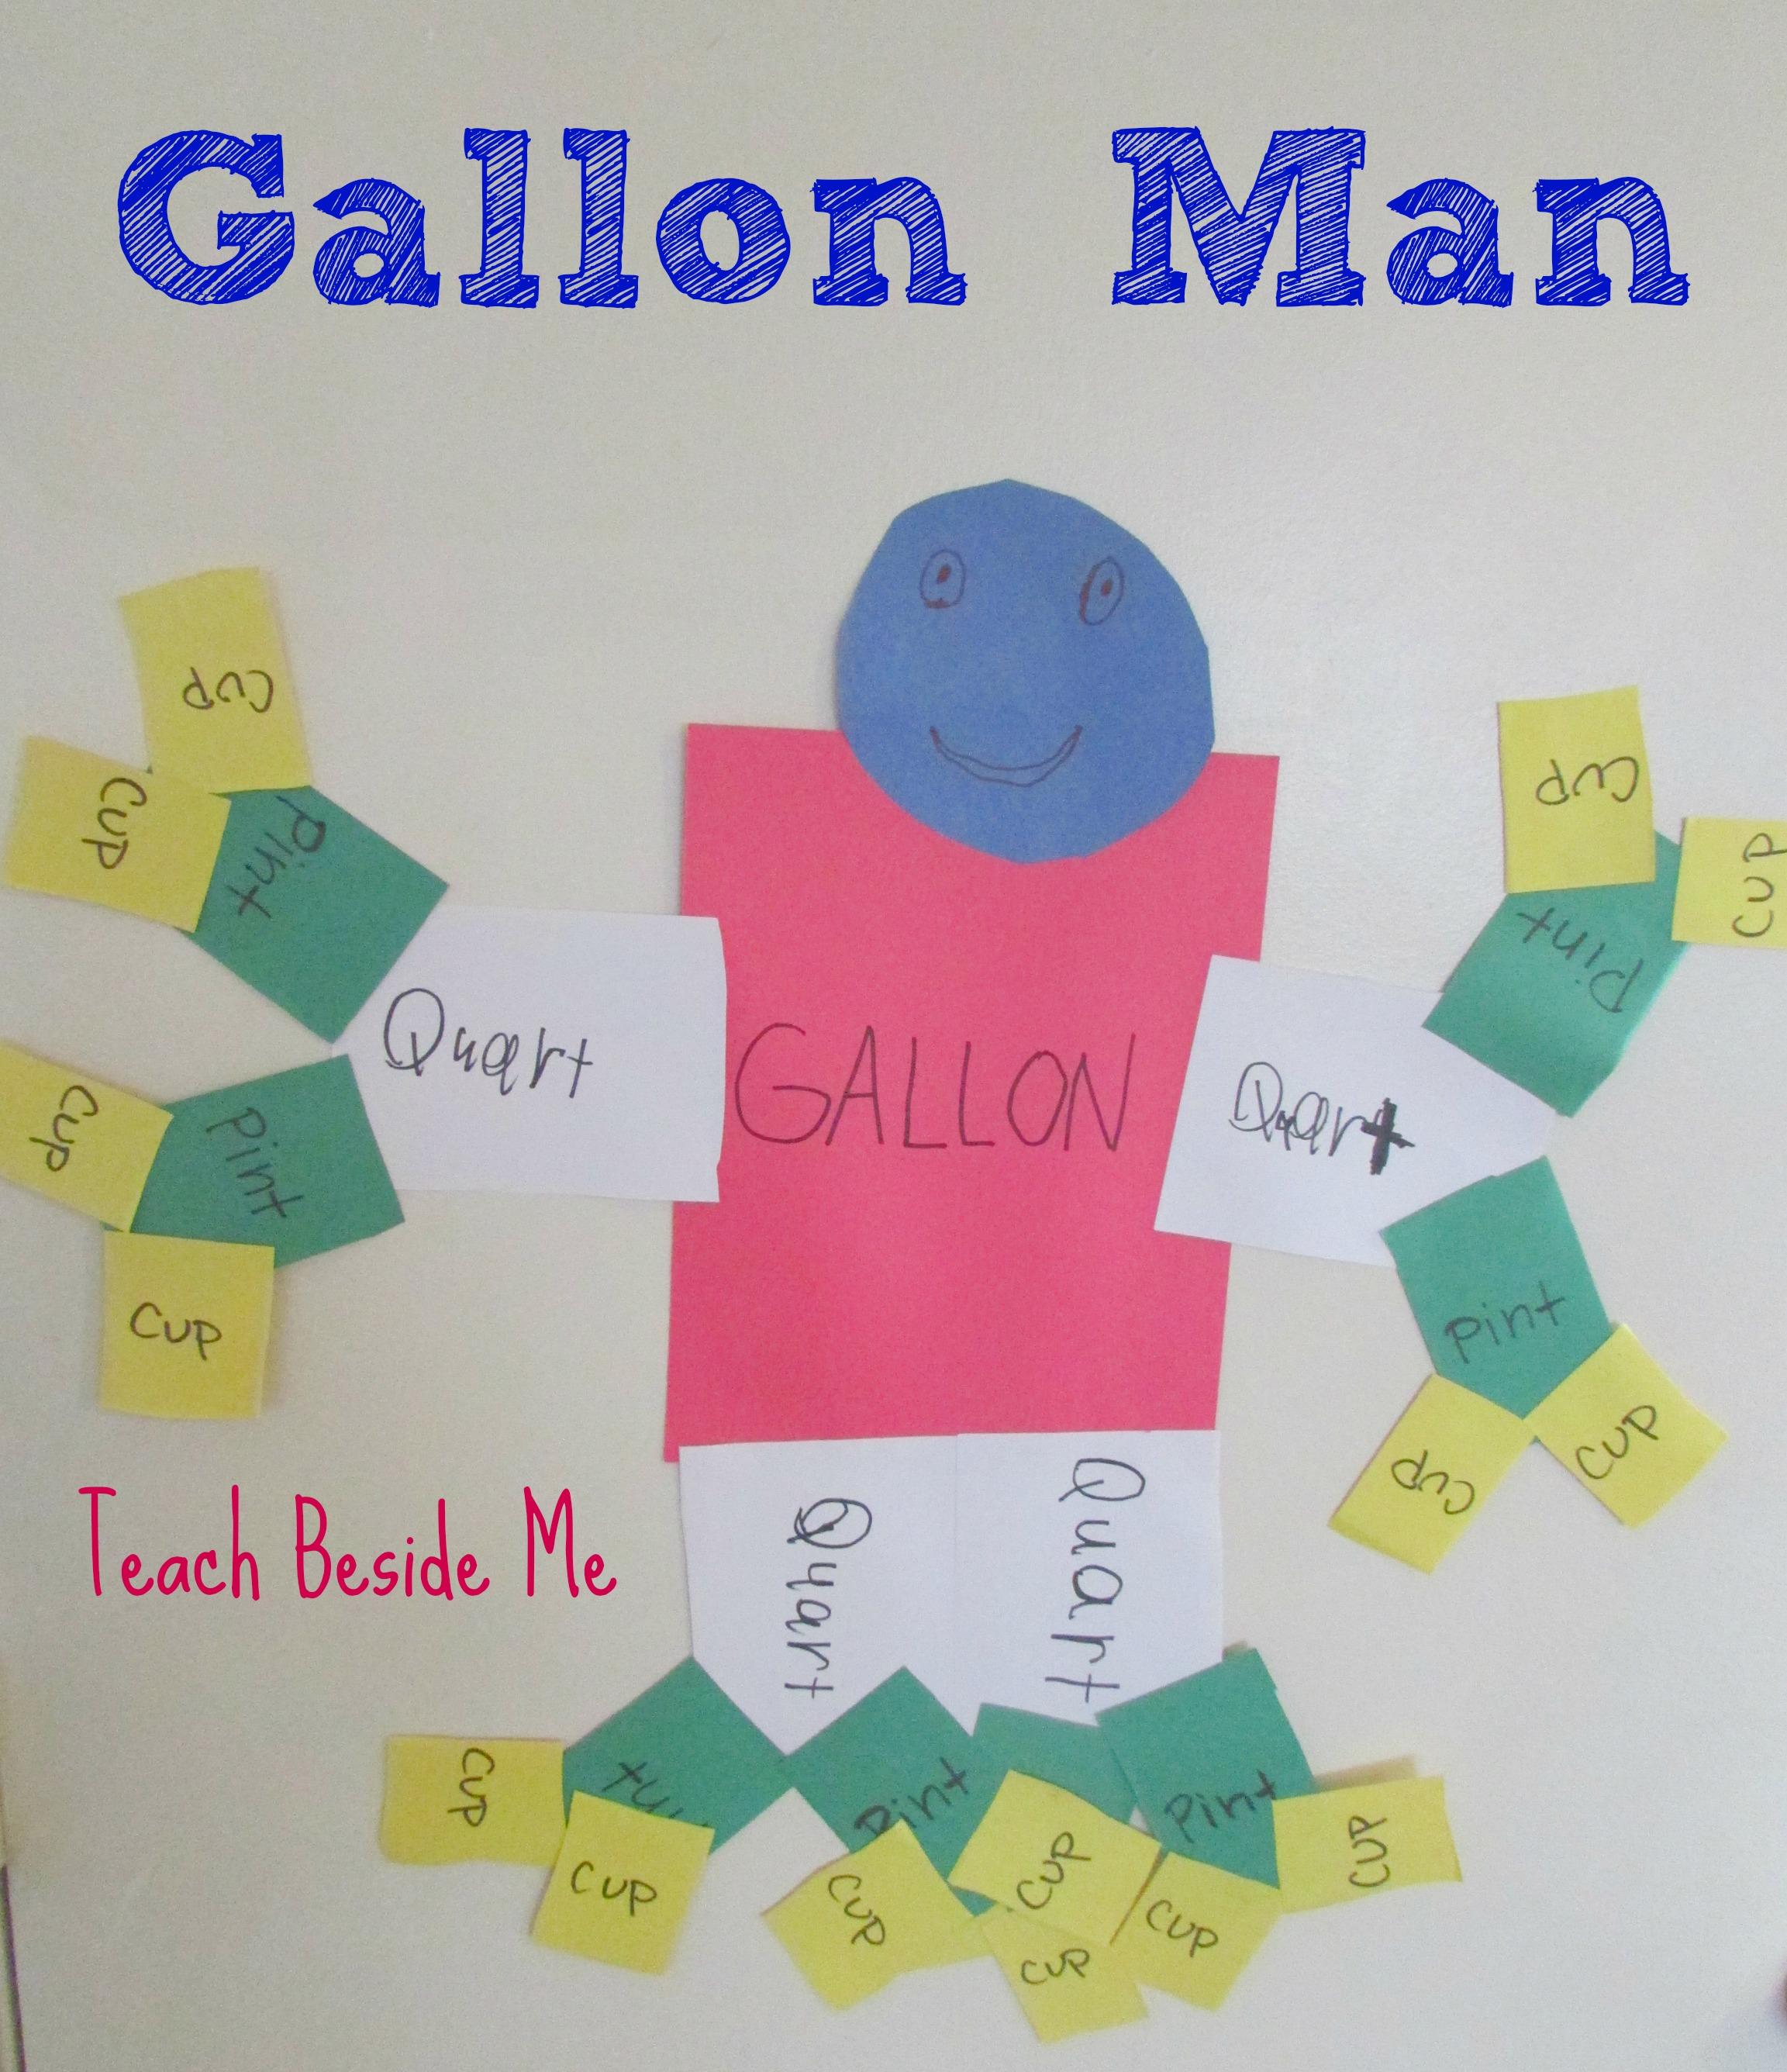 picture regarding Gallon Man Printable called How Innumerable Quarts in just a Gallon? Gallon Guy Prepare Beside Me